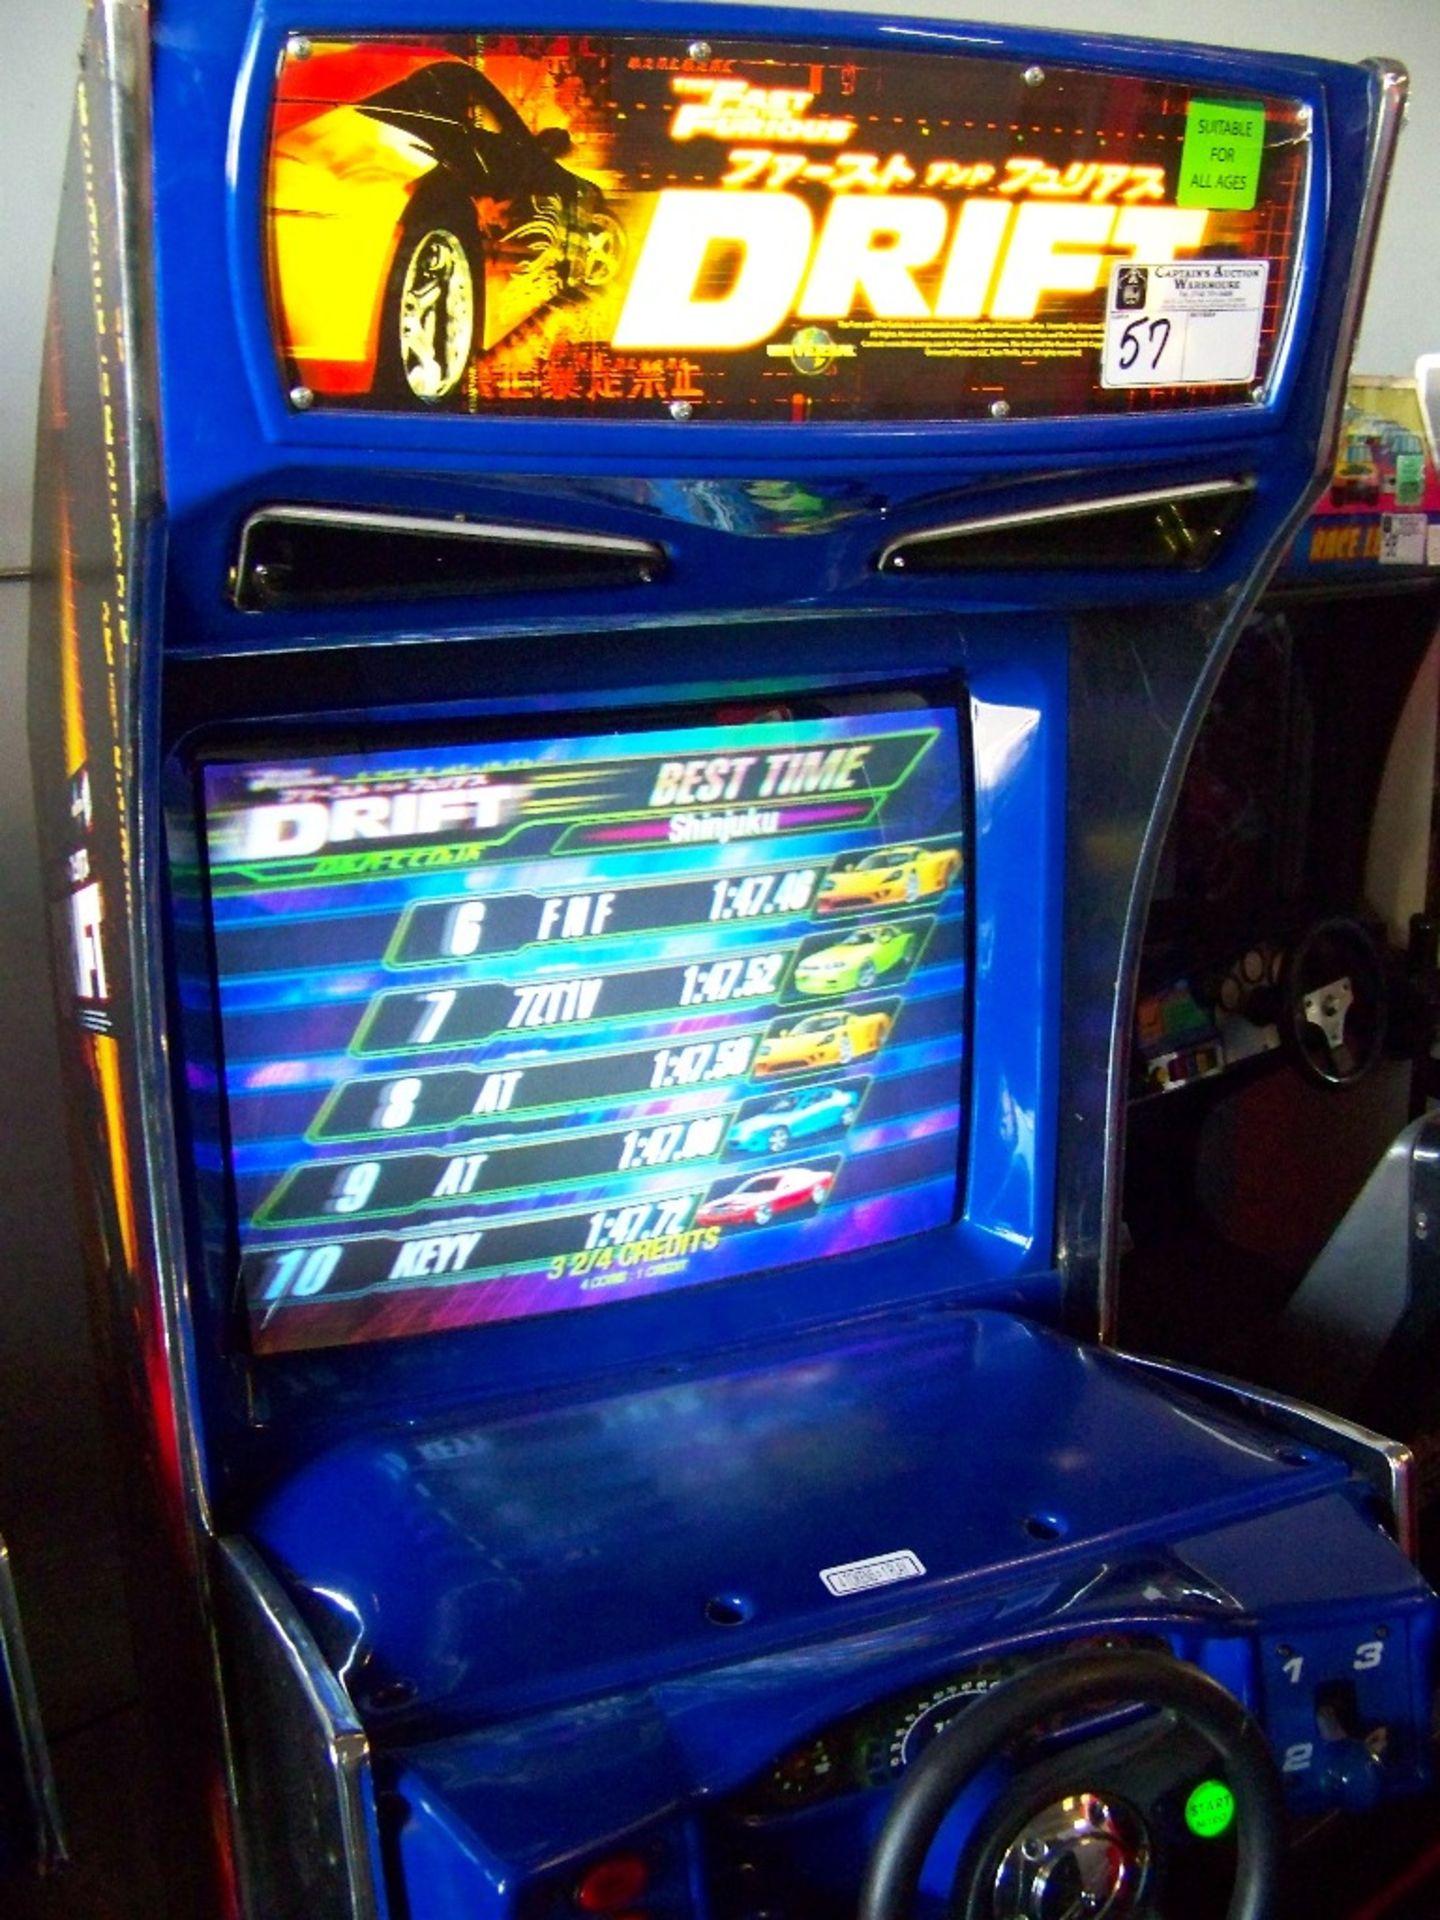 "DRIFT FAST & FURIOUS 31"" DX RACING ARCADE GAME"